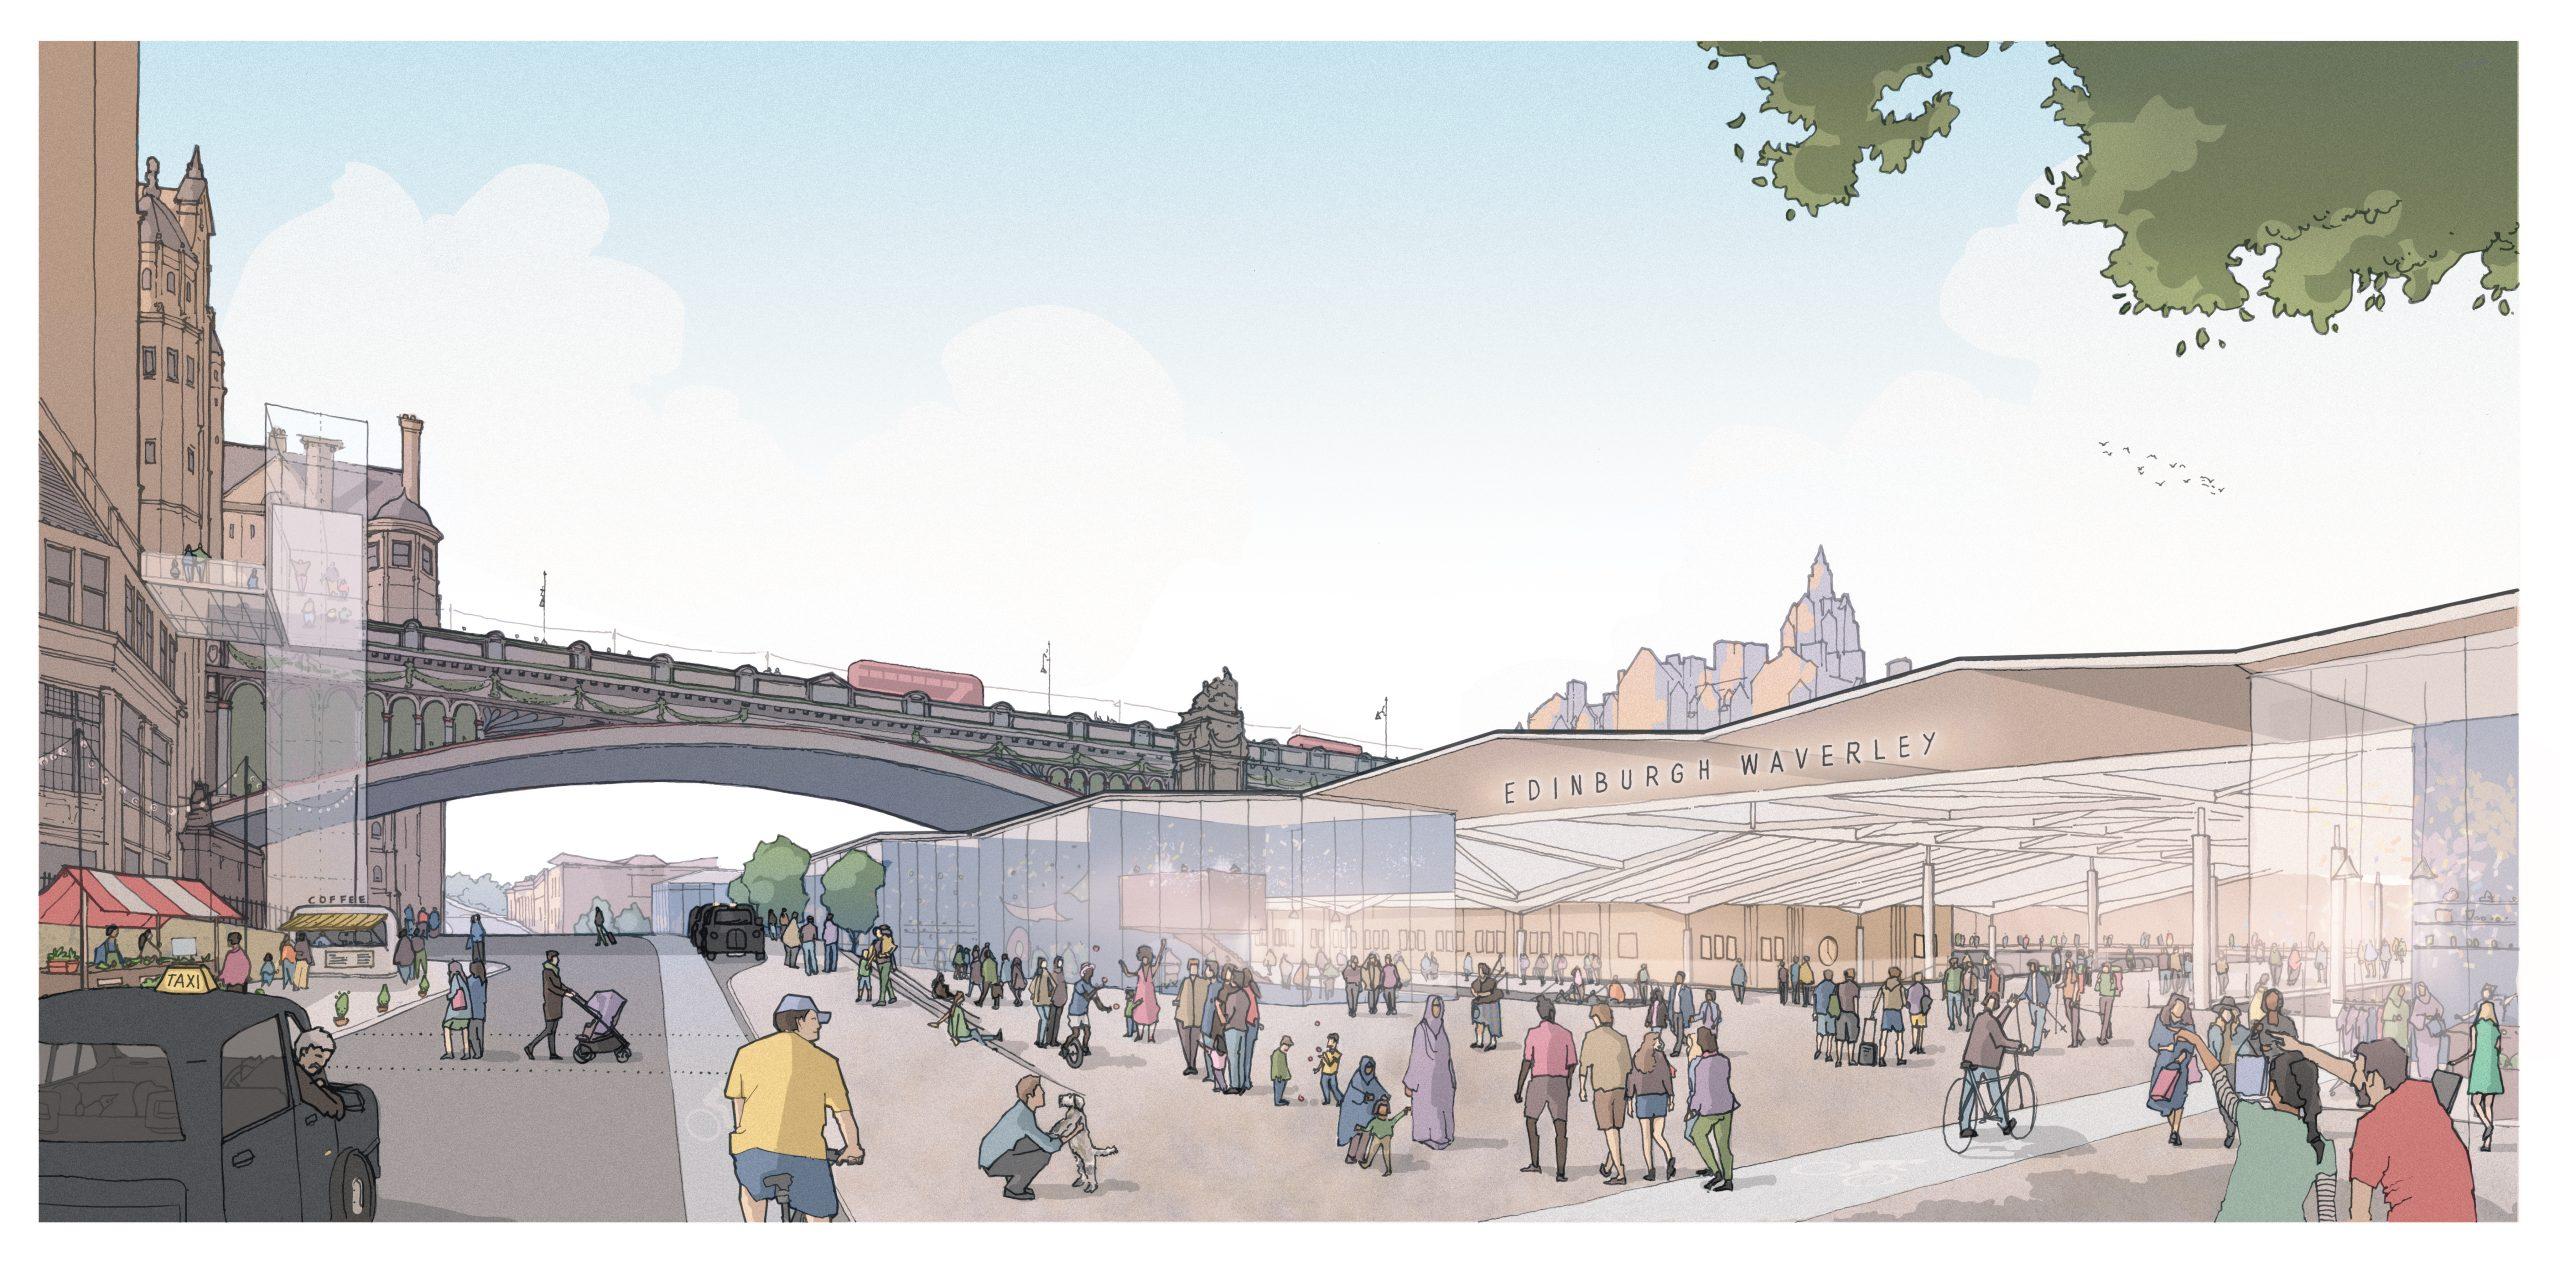 Waverley Masterplan revealed by Network Rail